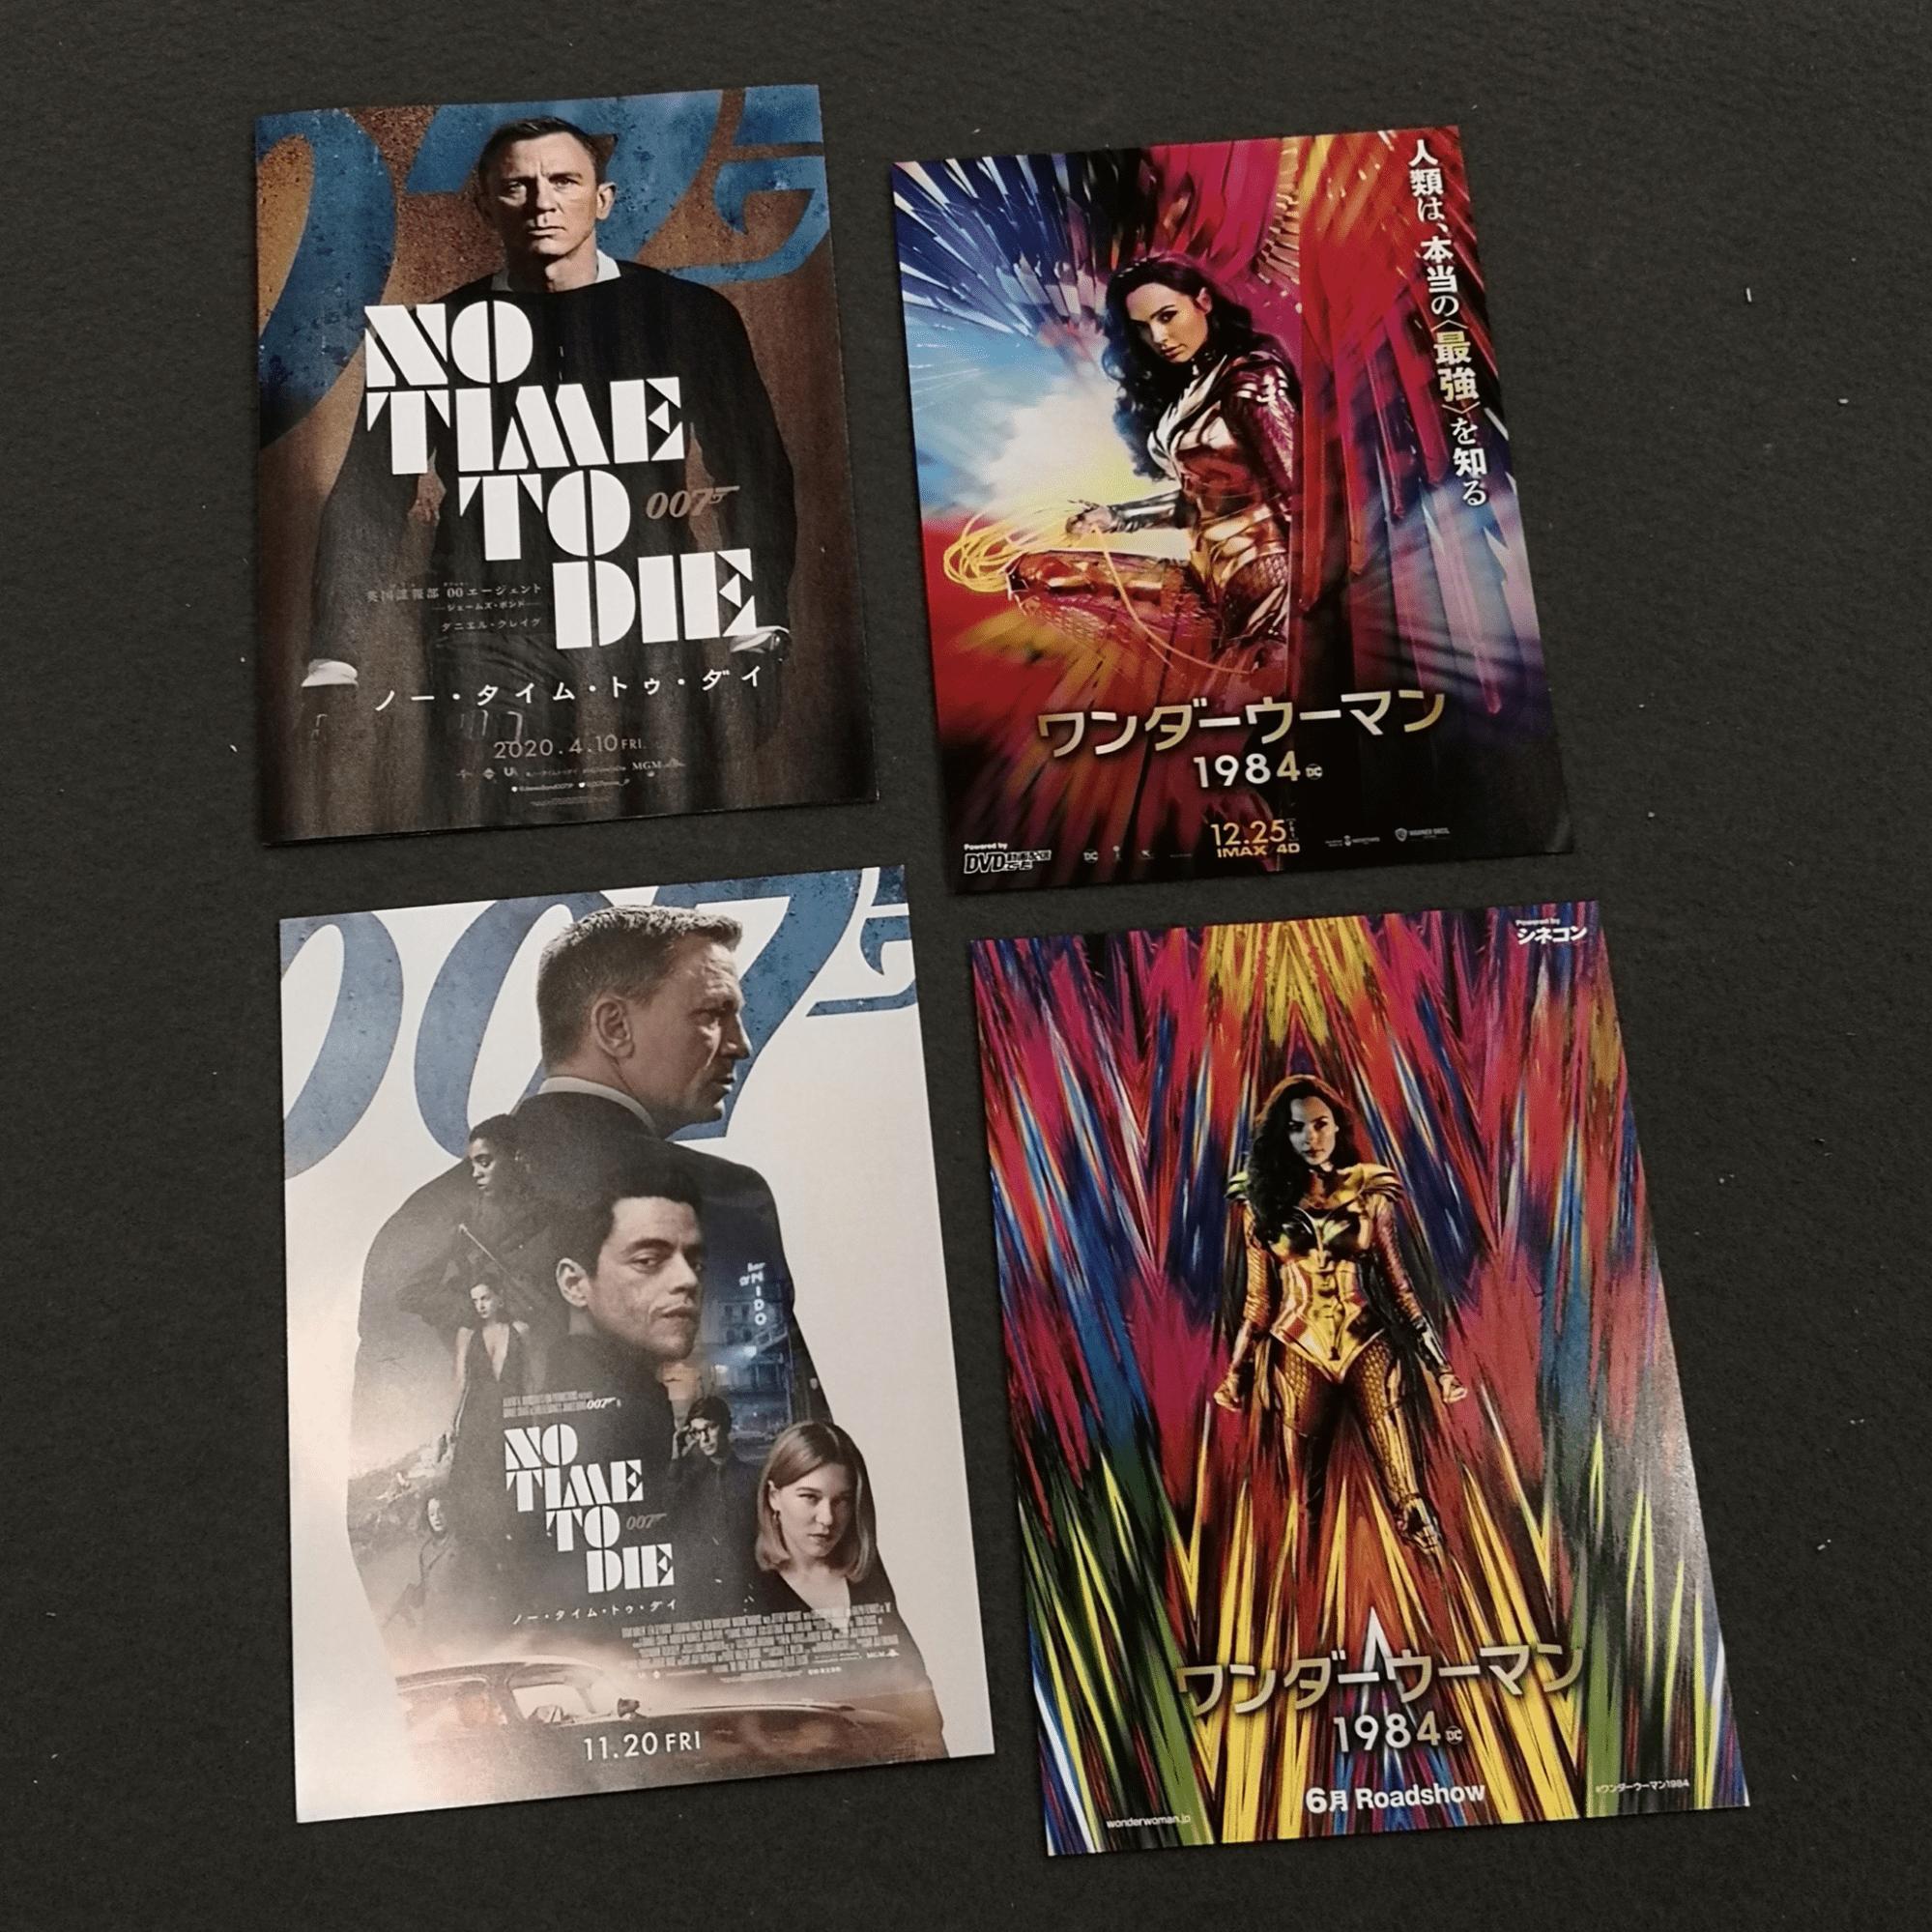 poster hub singapore's selection